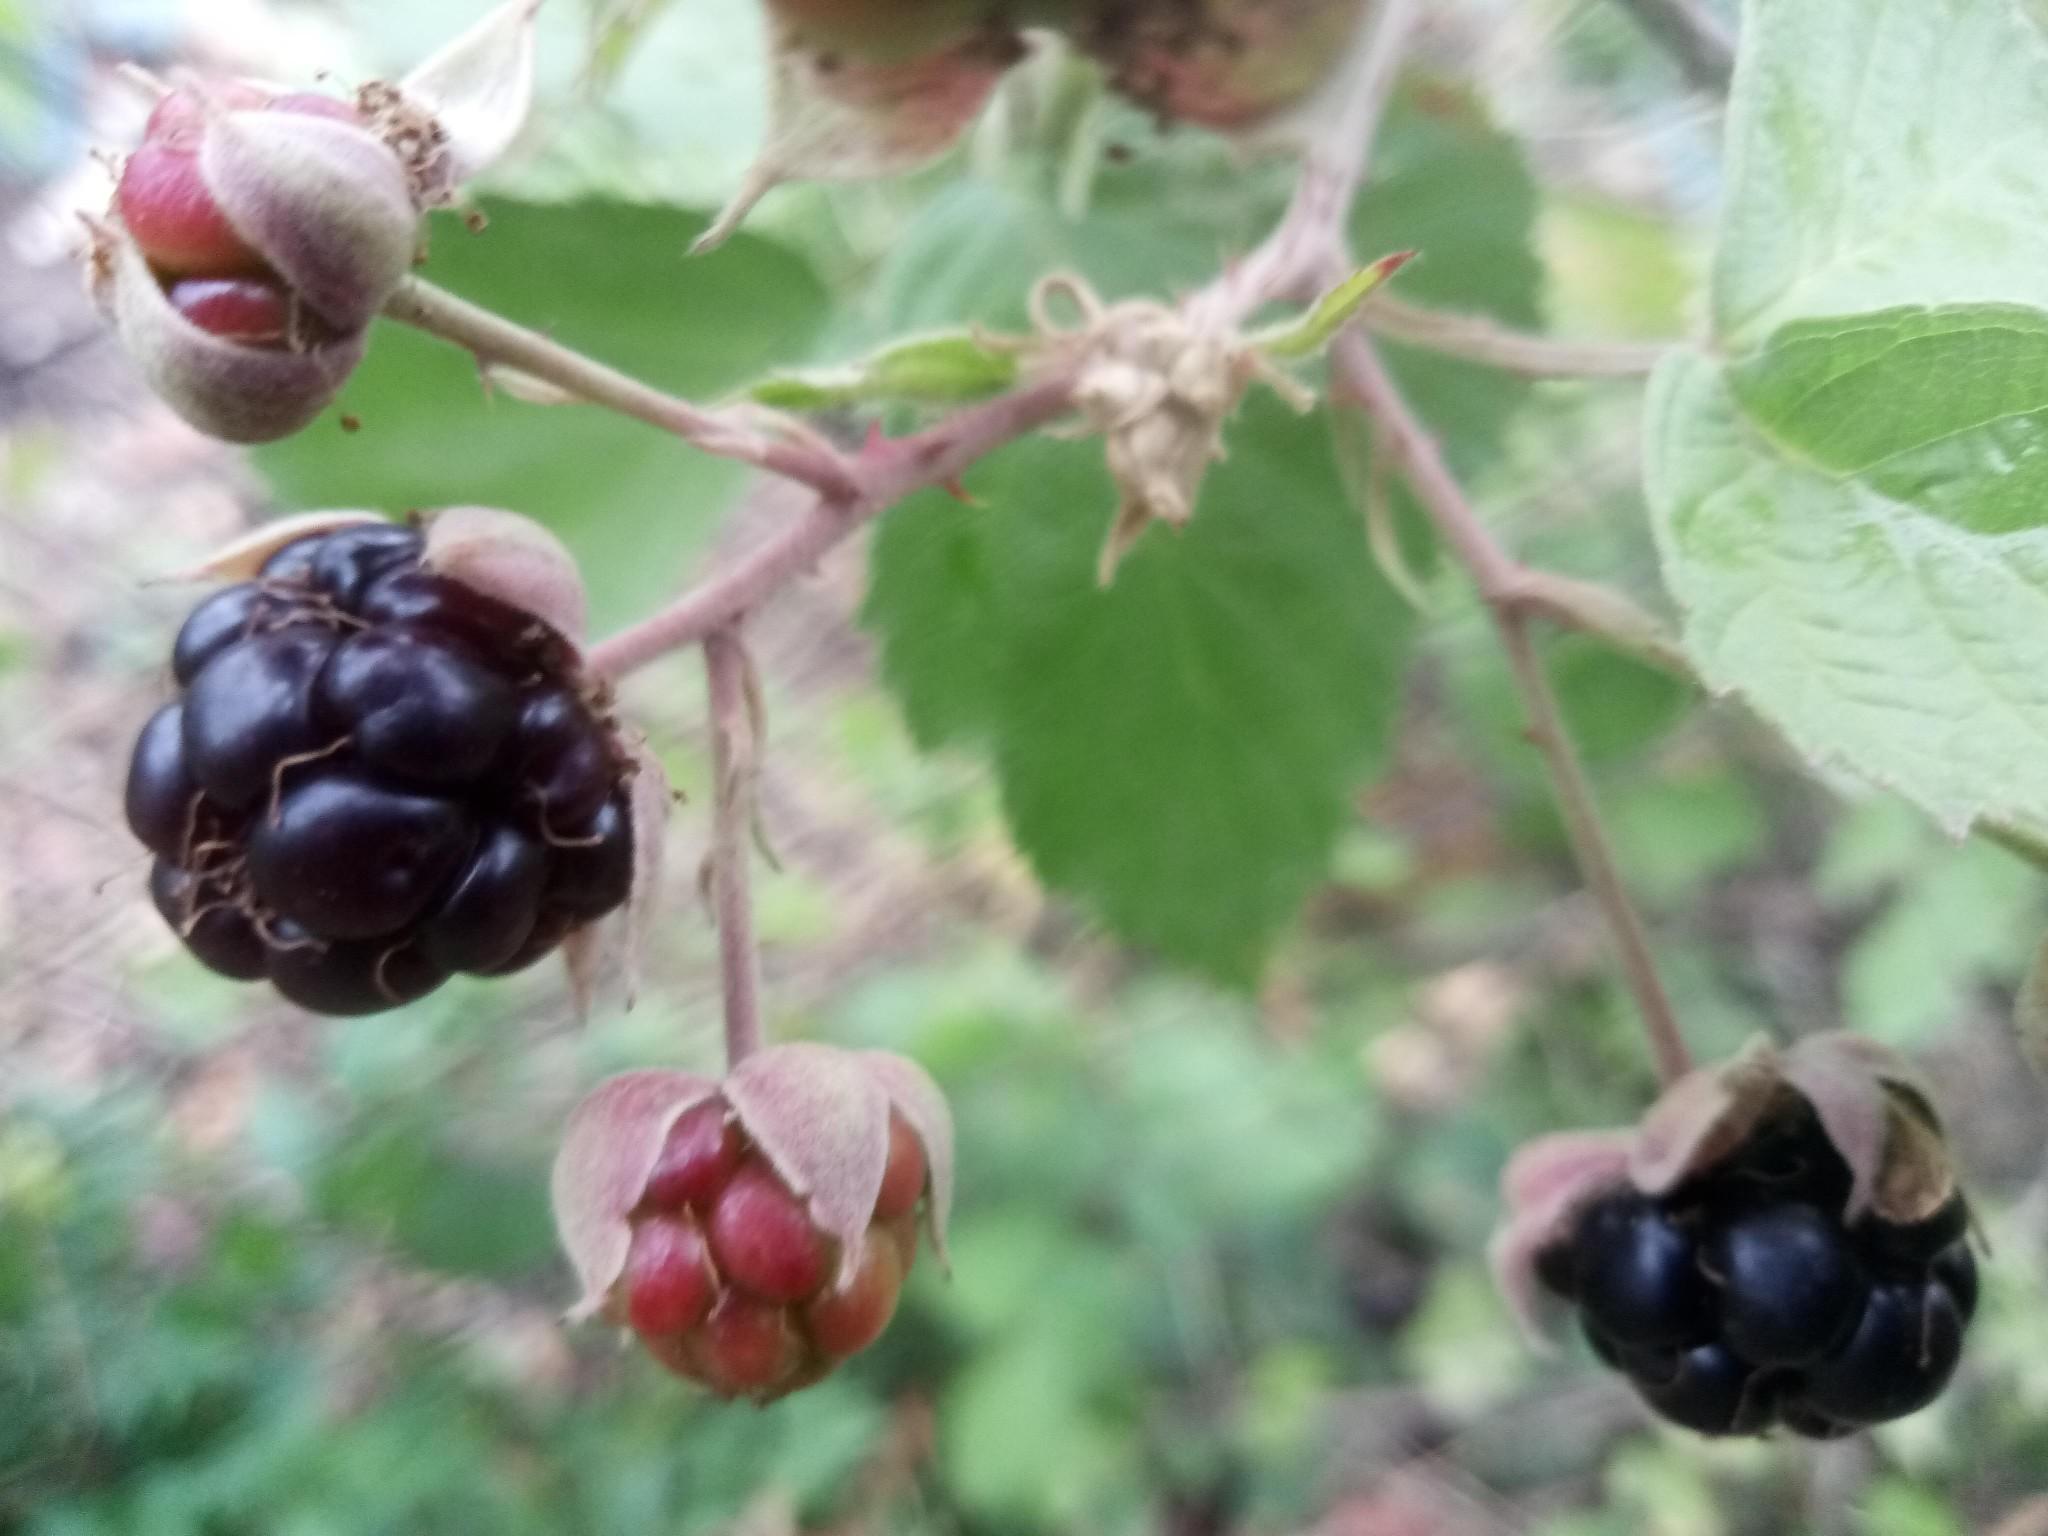 Blackberry photos